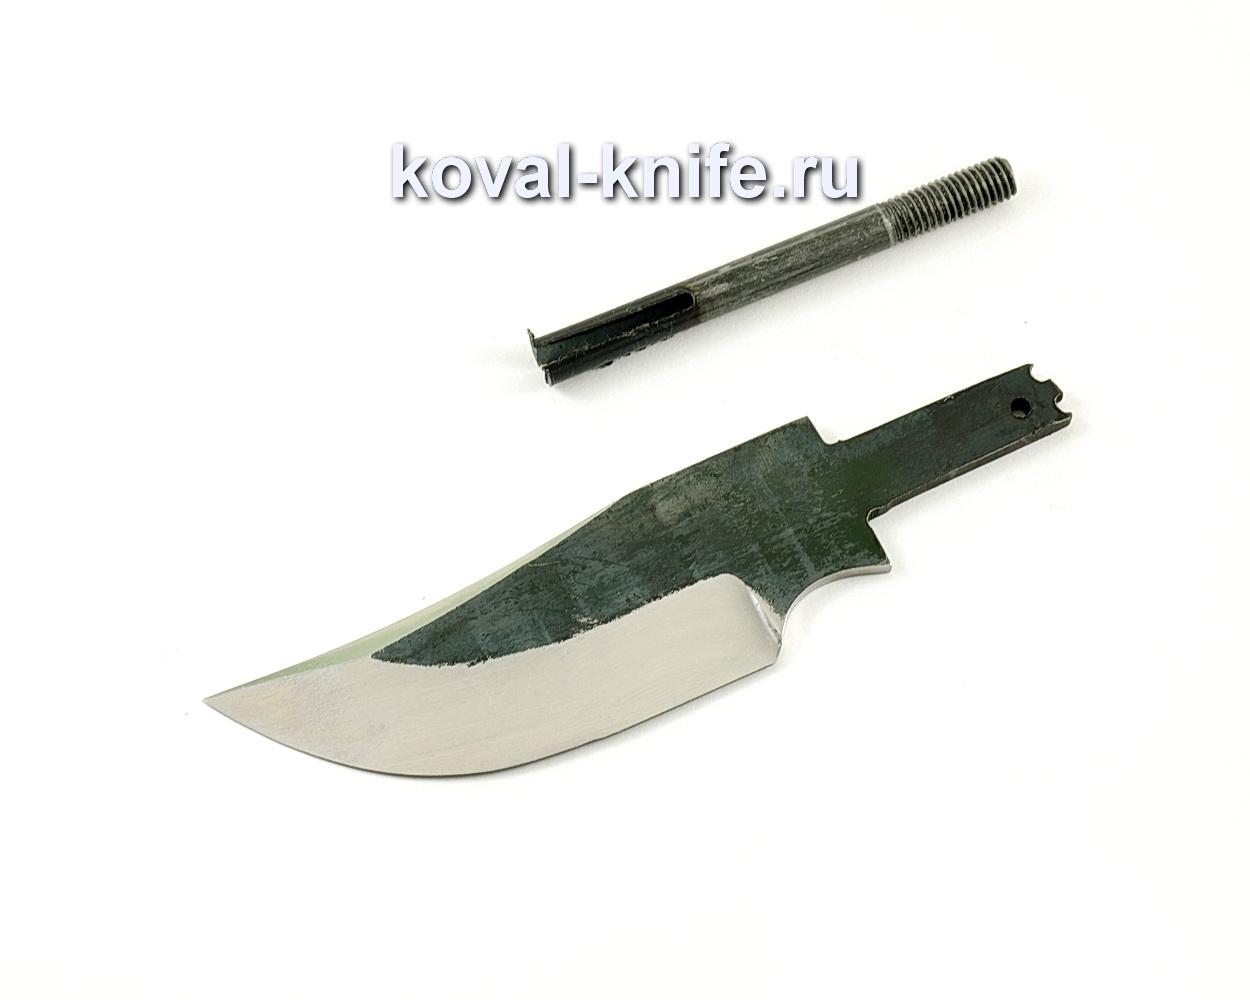 Клинок для ножа Бекас (кованая сталь 110Х18 МШД)